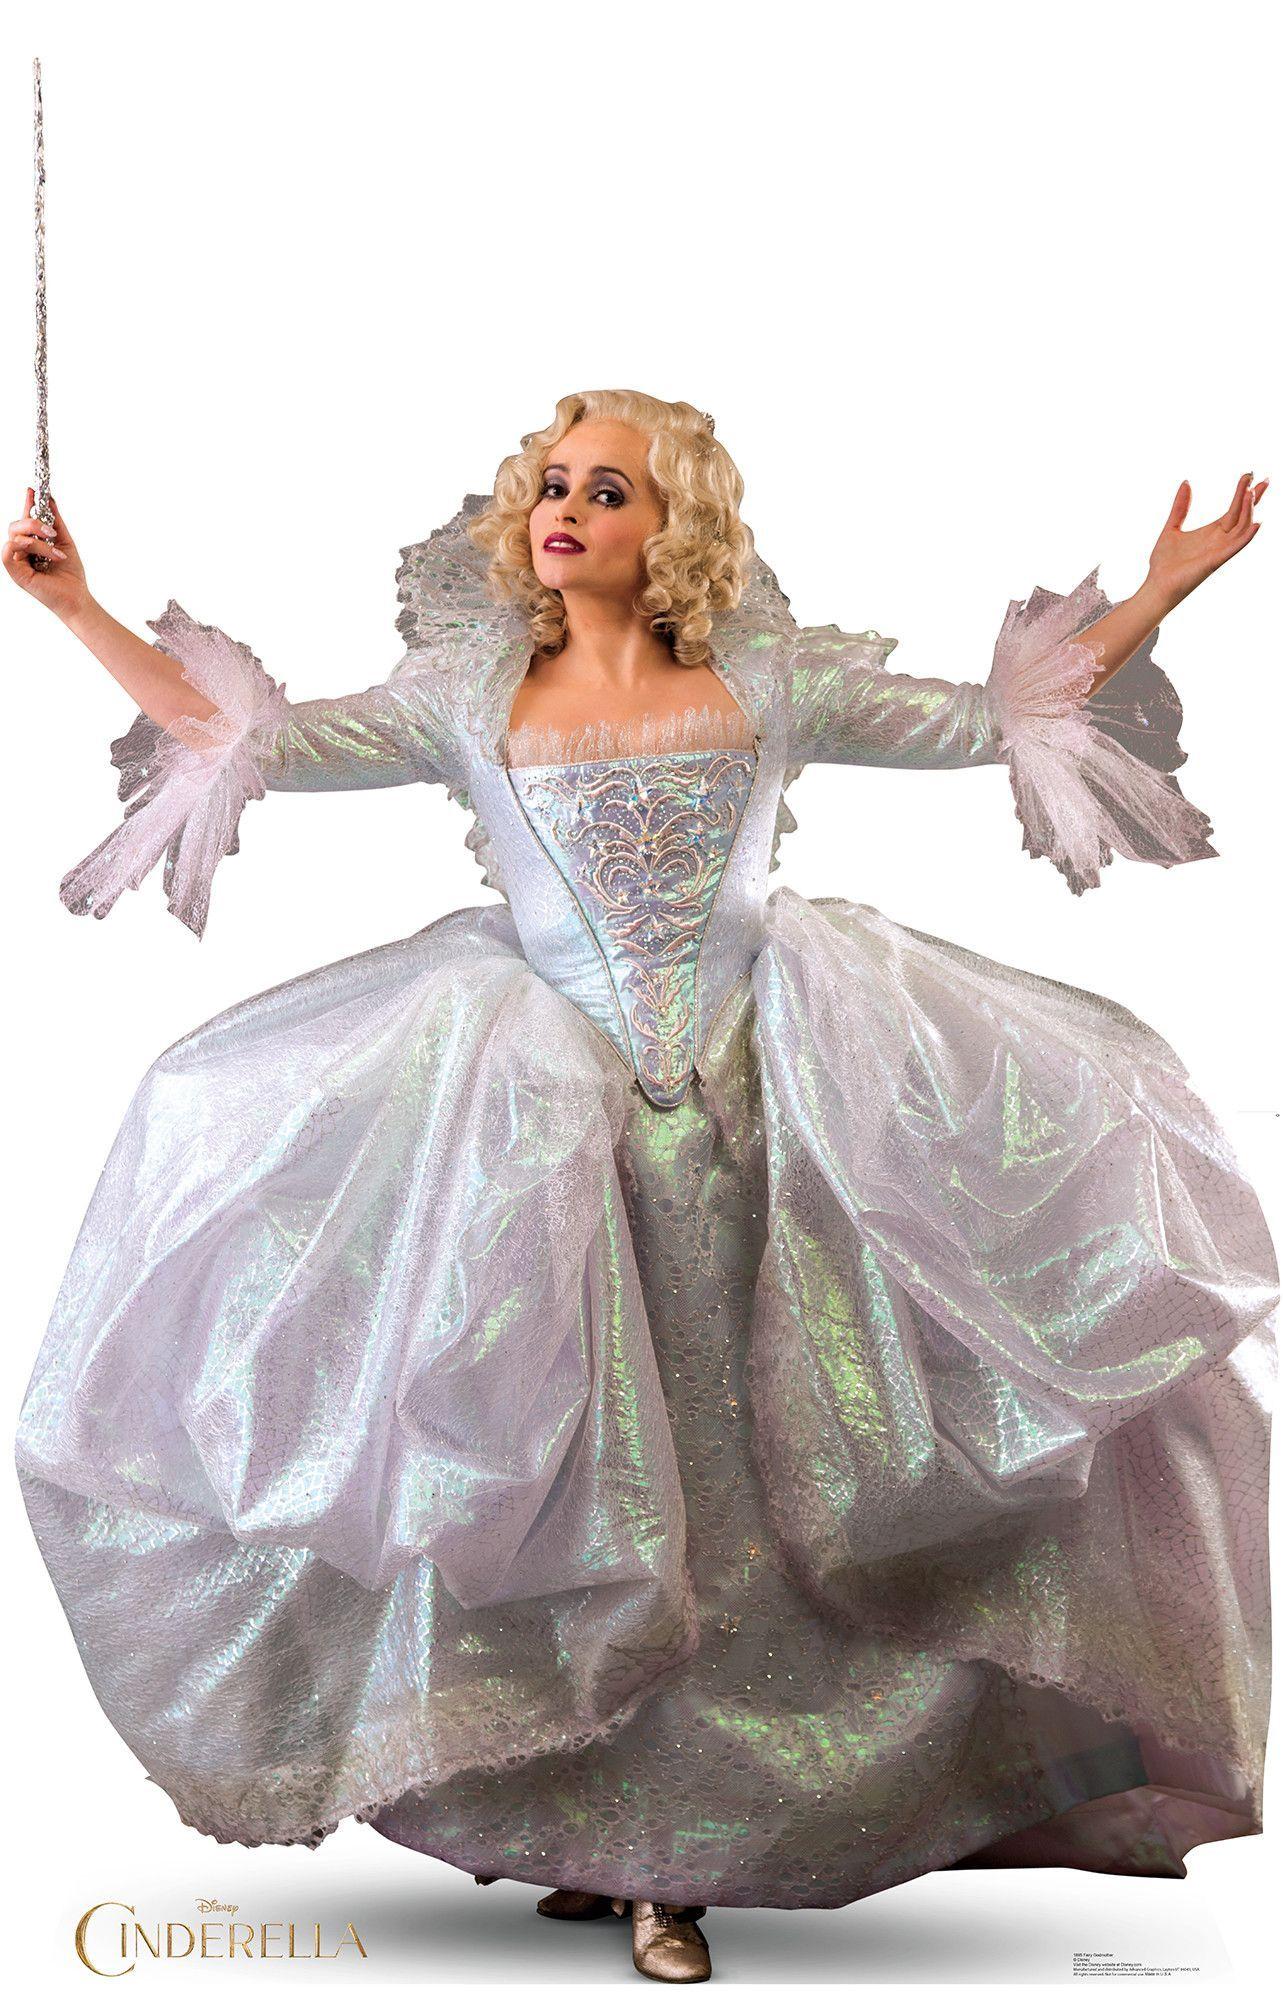 Cinderella 2015 Fairy Godmother Cardboard Standup Cinderella